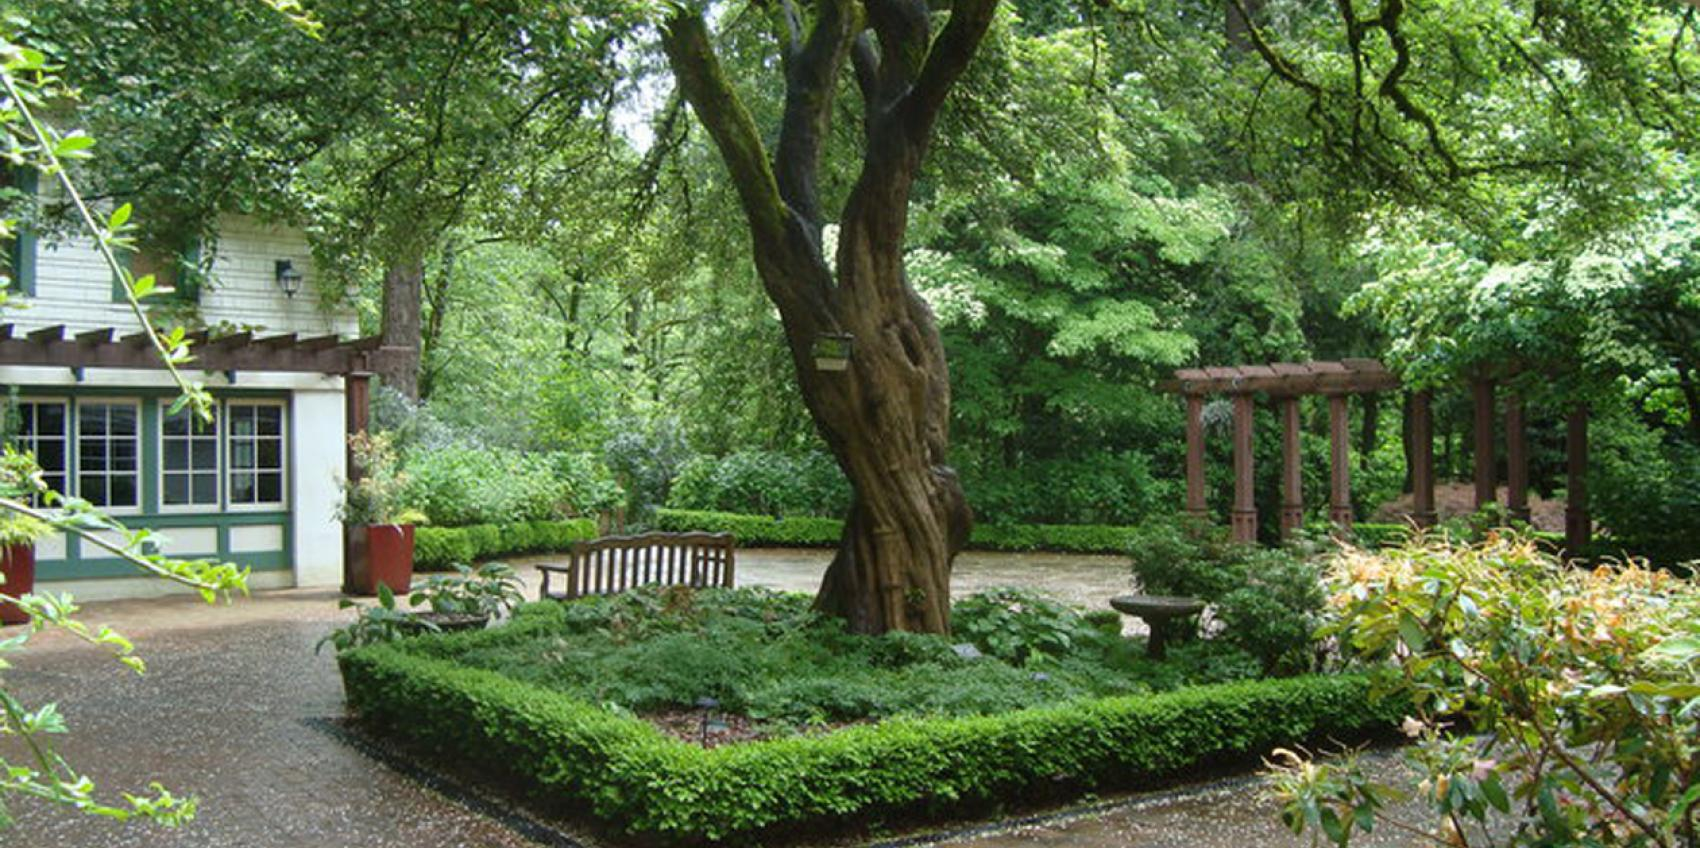 Leach Botanical Garden American Public Gardens Association